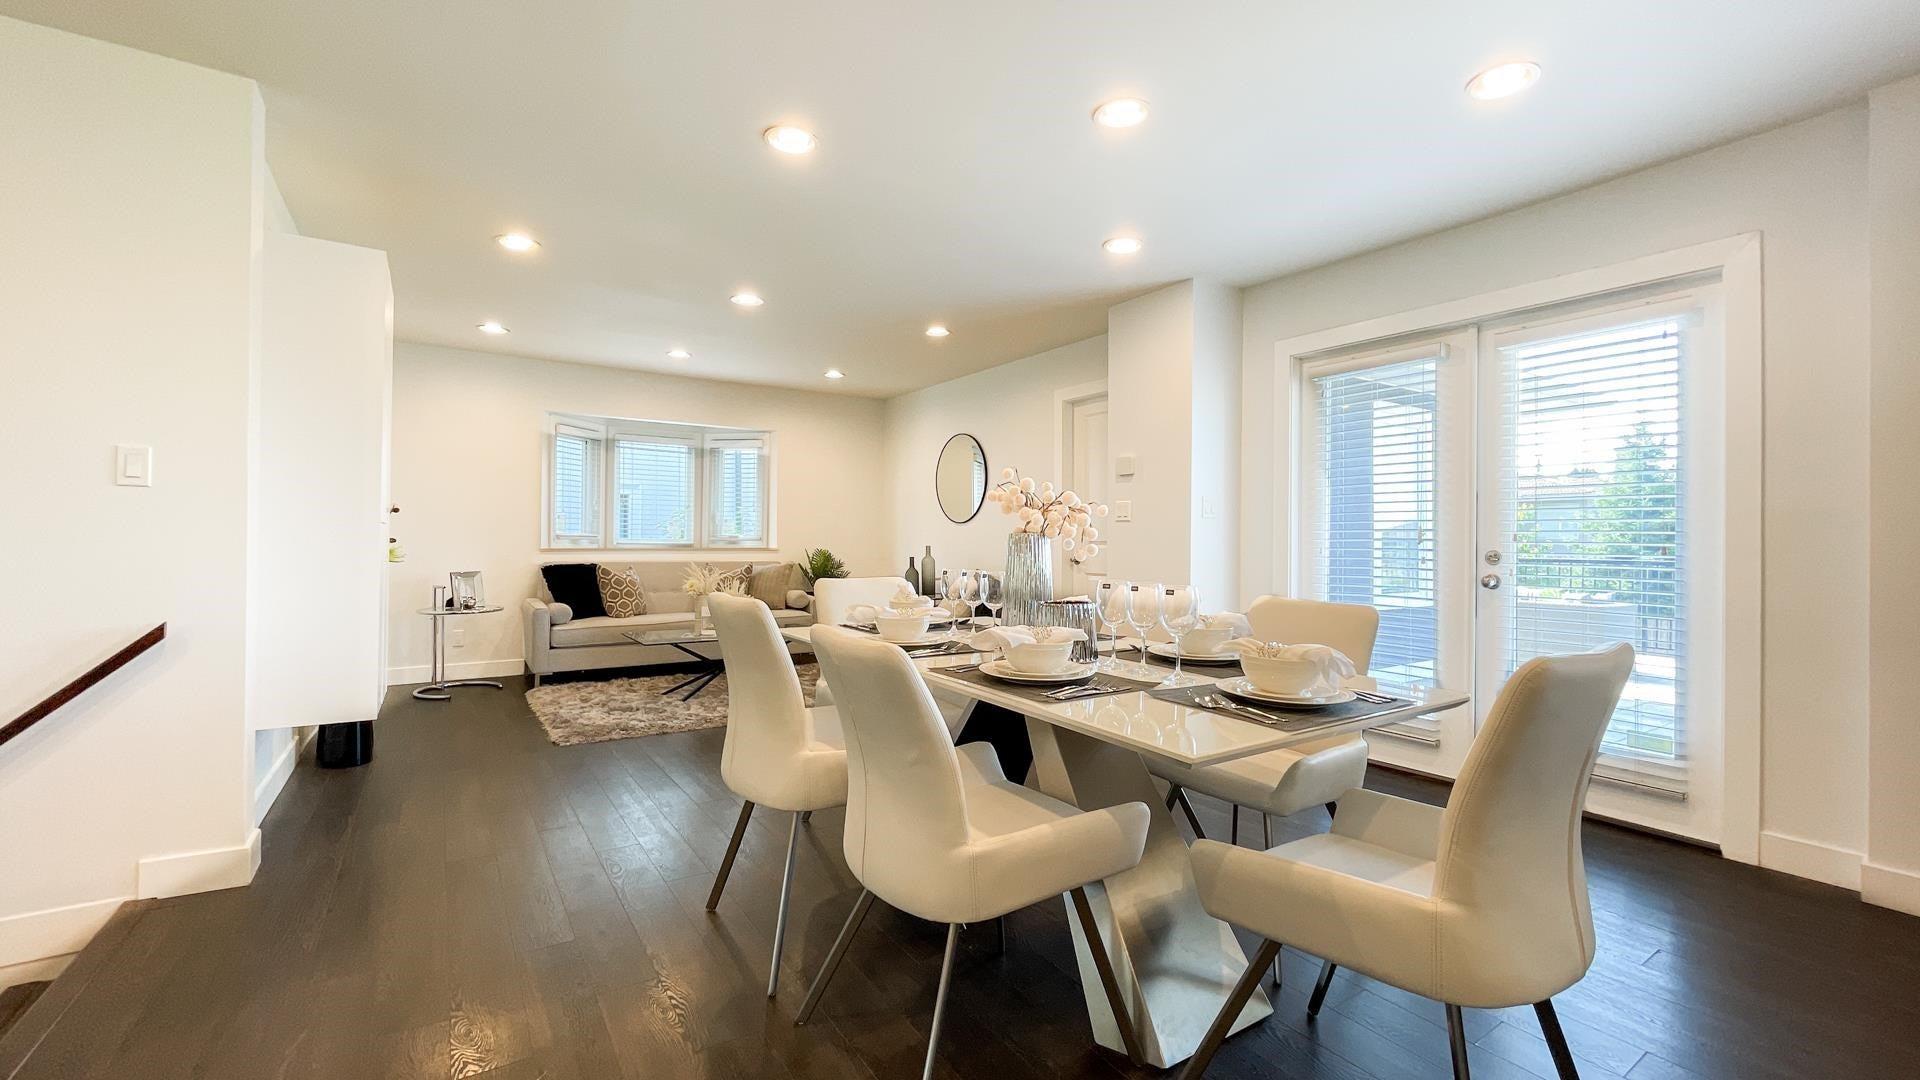 1168 JEFFERSON AVENUE - Ambleside House/Single Family for sale, 6 Bedrooms (R2602275) - #7